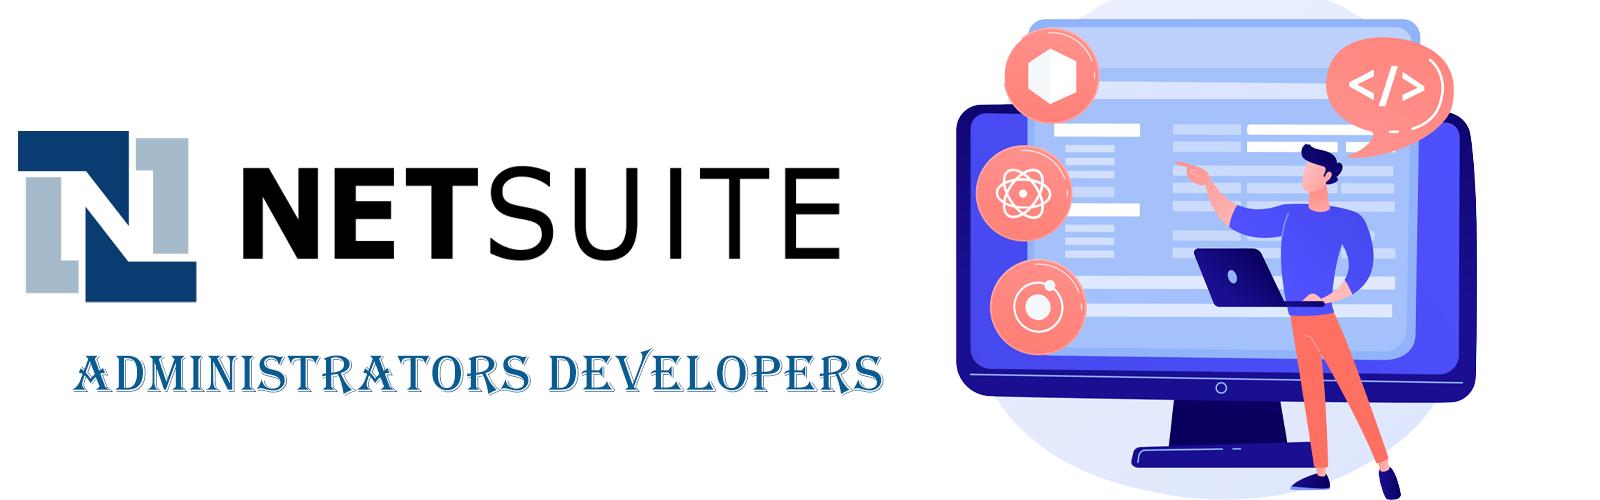 Netsuite Administrators Developers